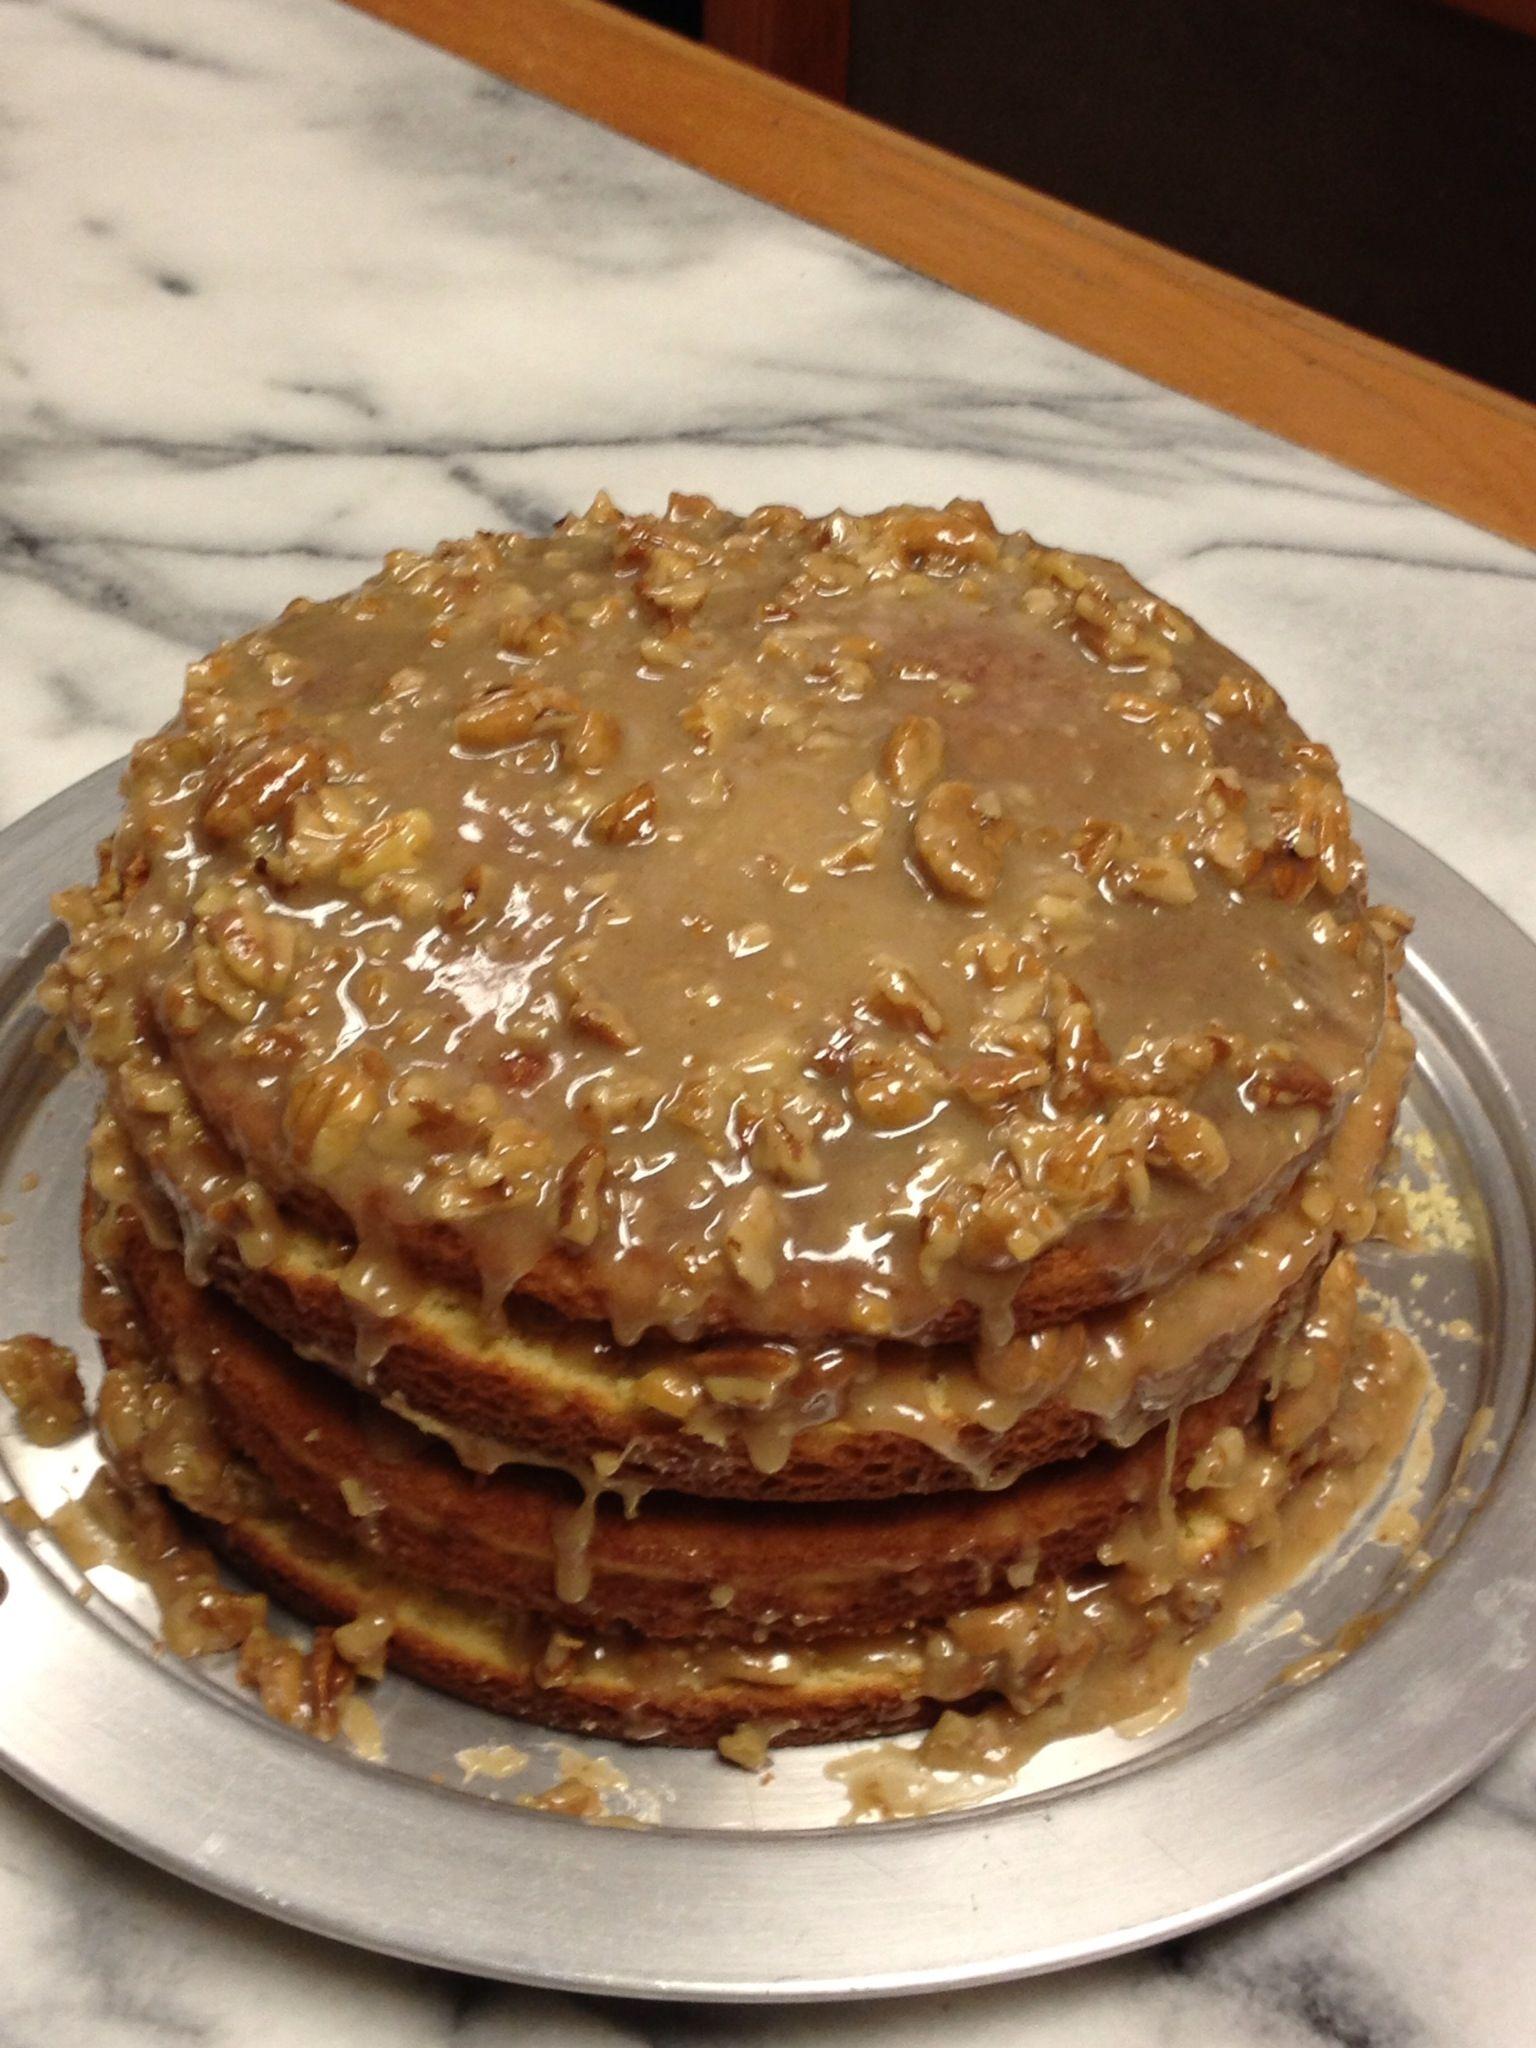 Old fashioned pecan praline cake | Fabulous Desserts | Pinterest